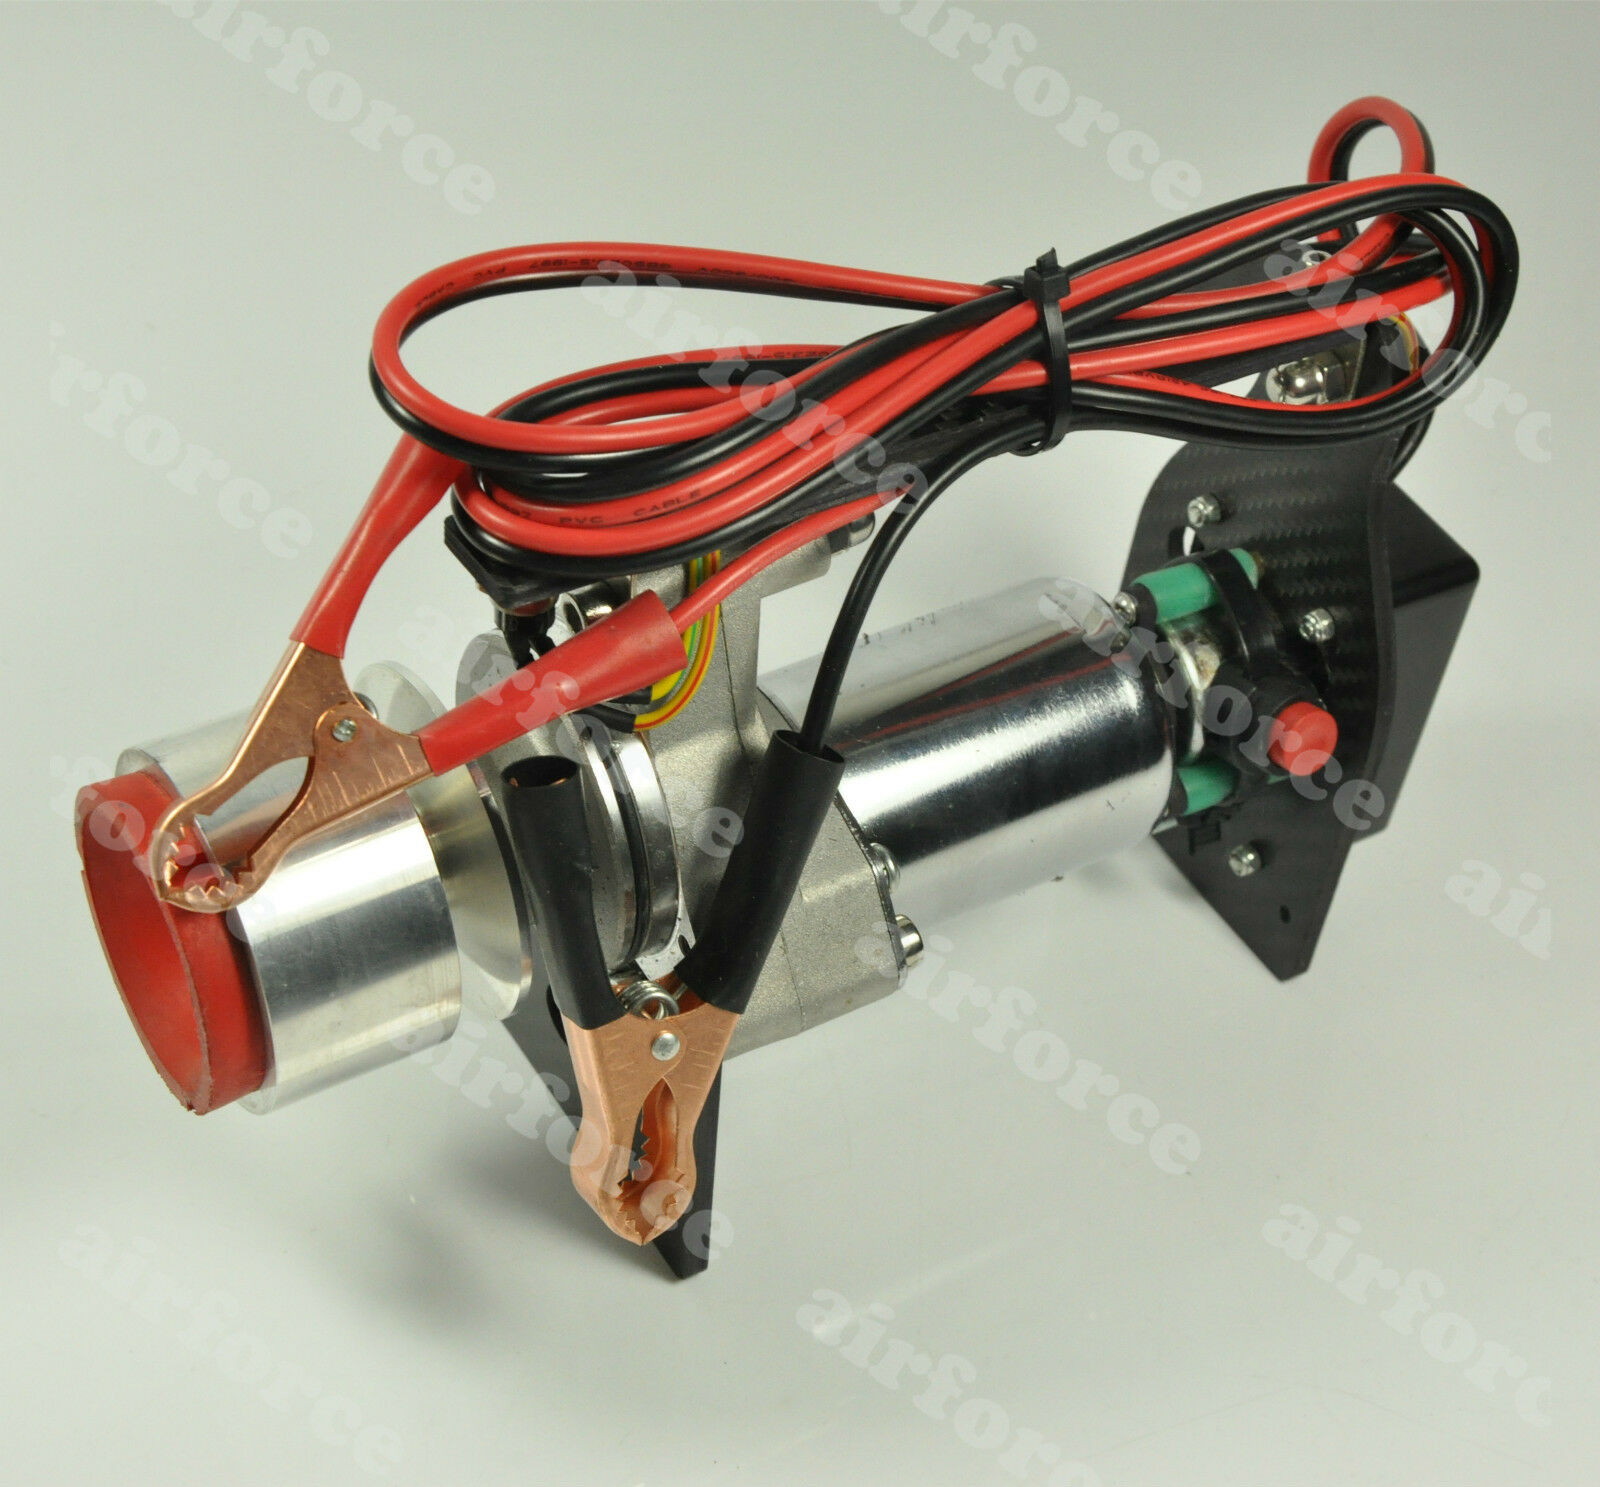 1 Set Toc rojoo Terminator de arranque motor de avión para gas 20-80cc kits de arranque